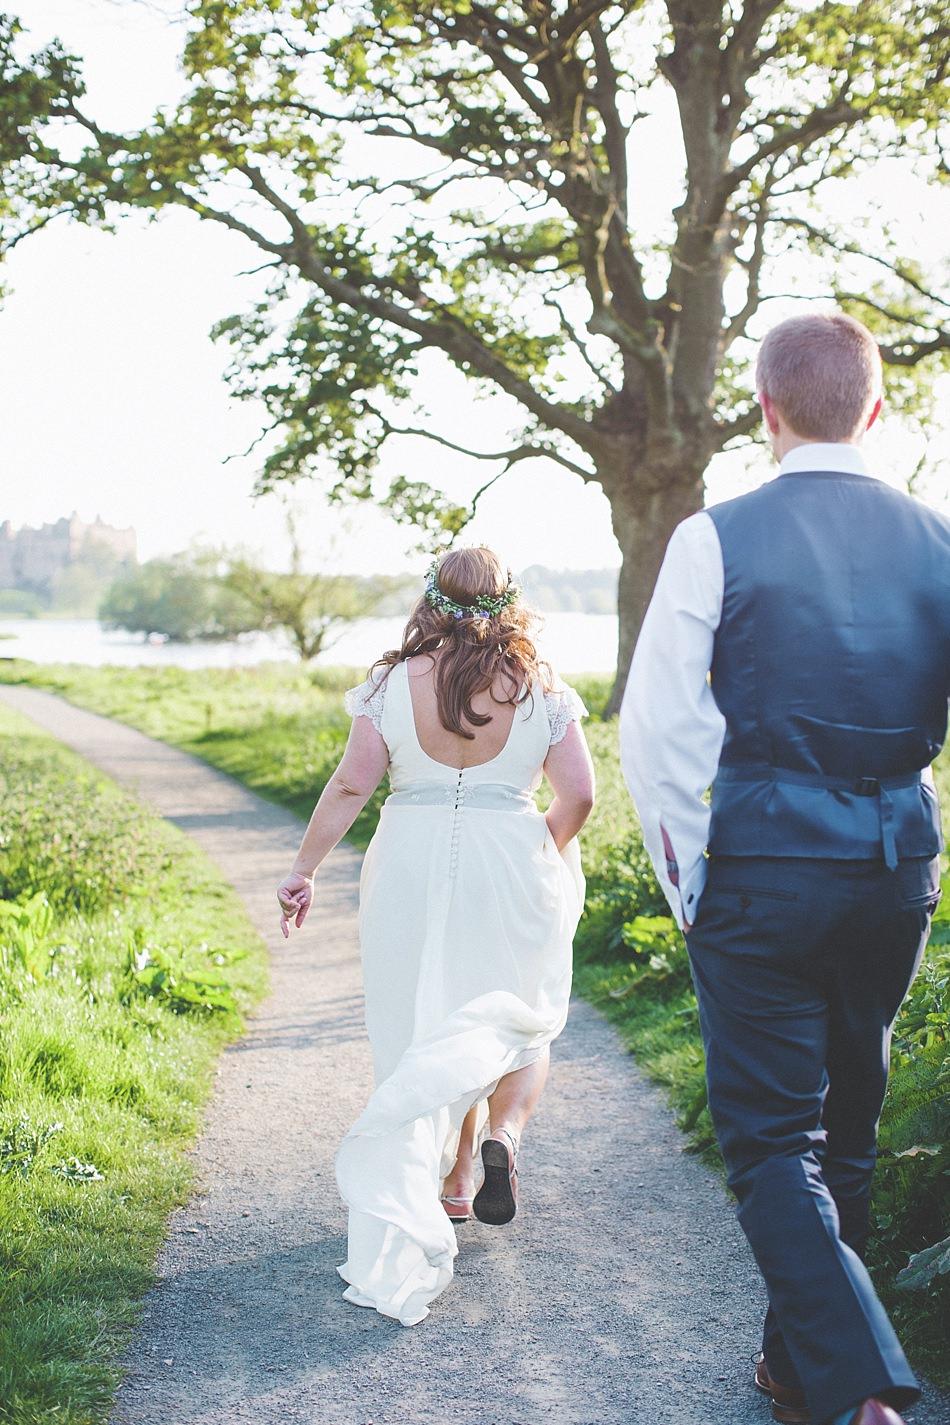 creative wedding photographers scotland 5-22.jpg